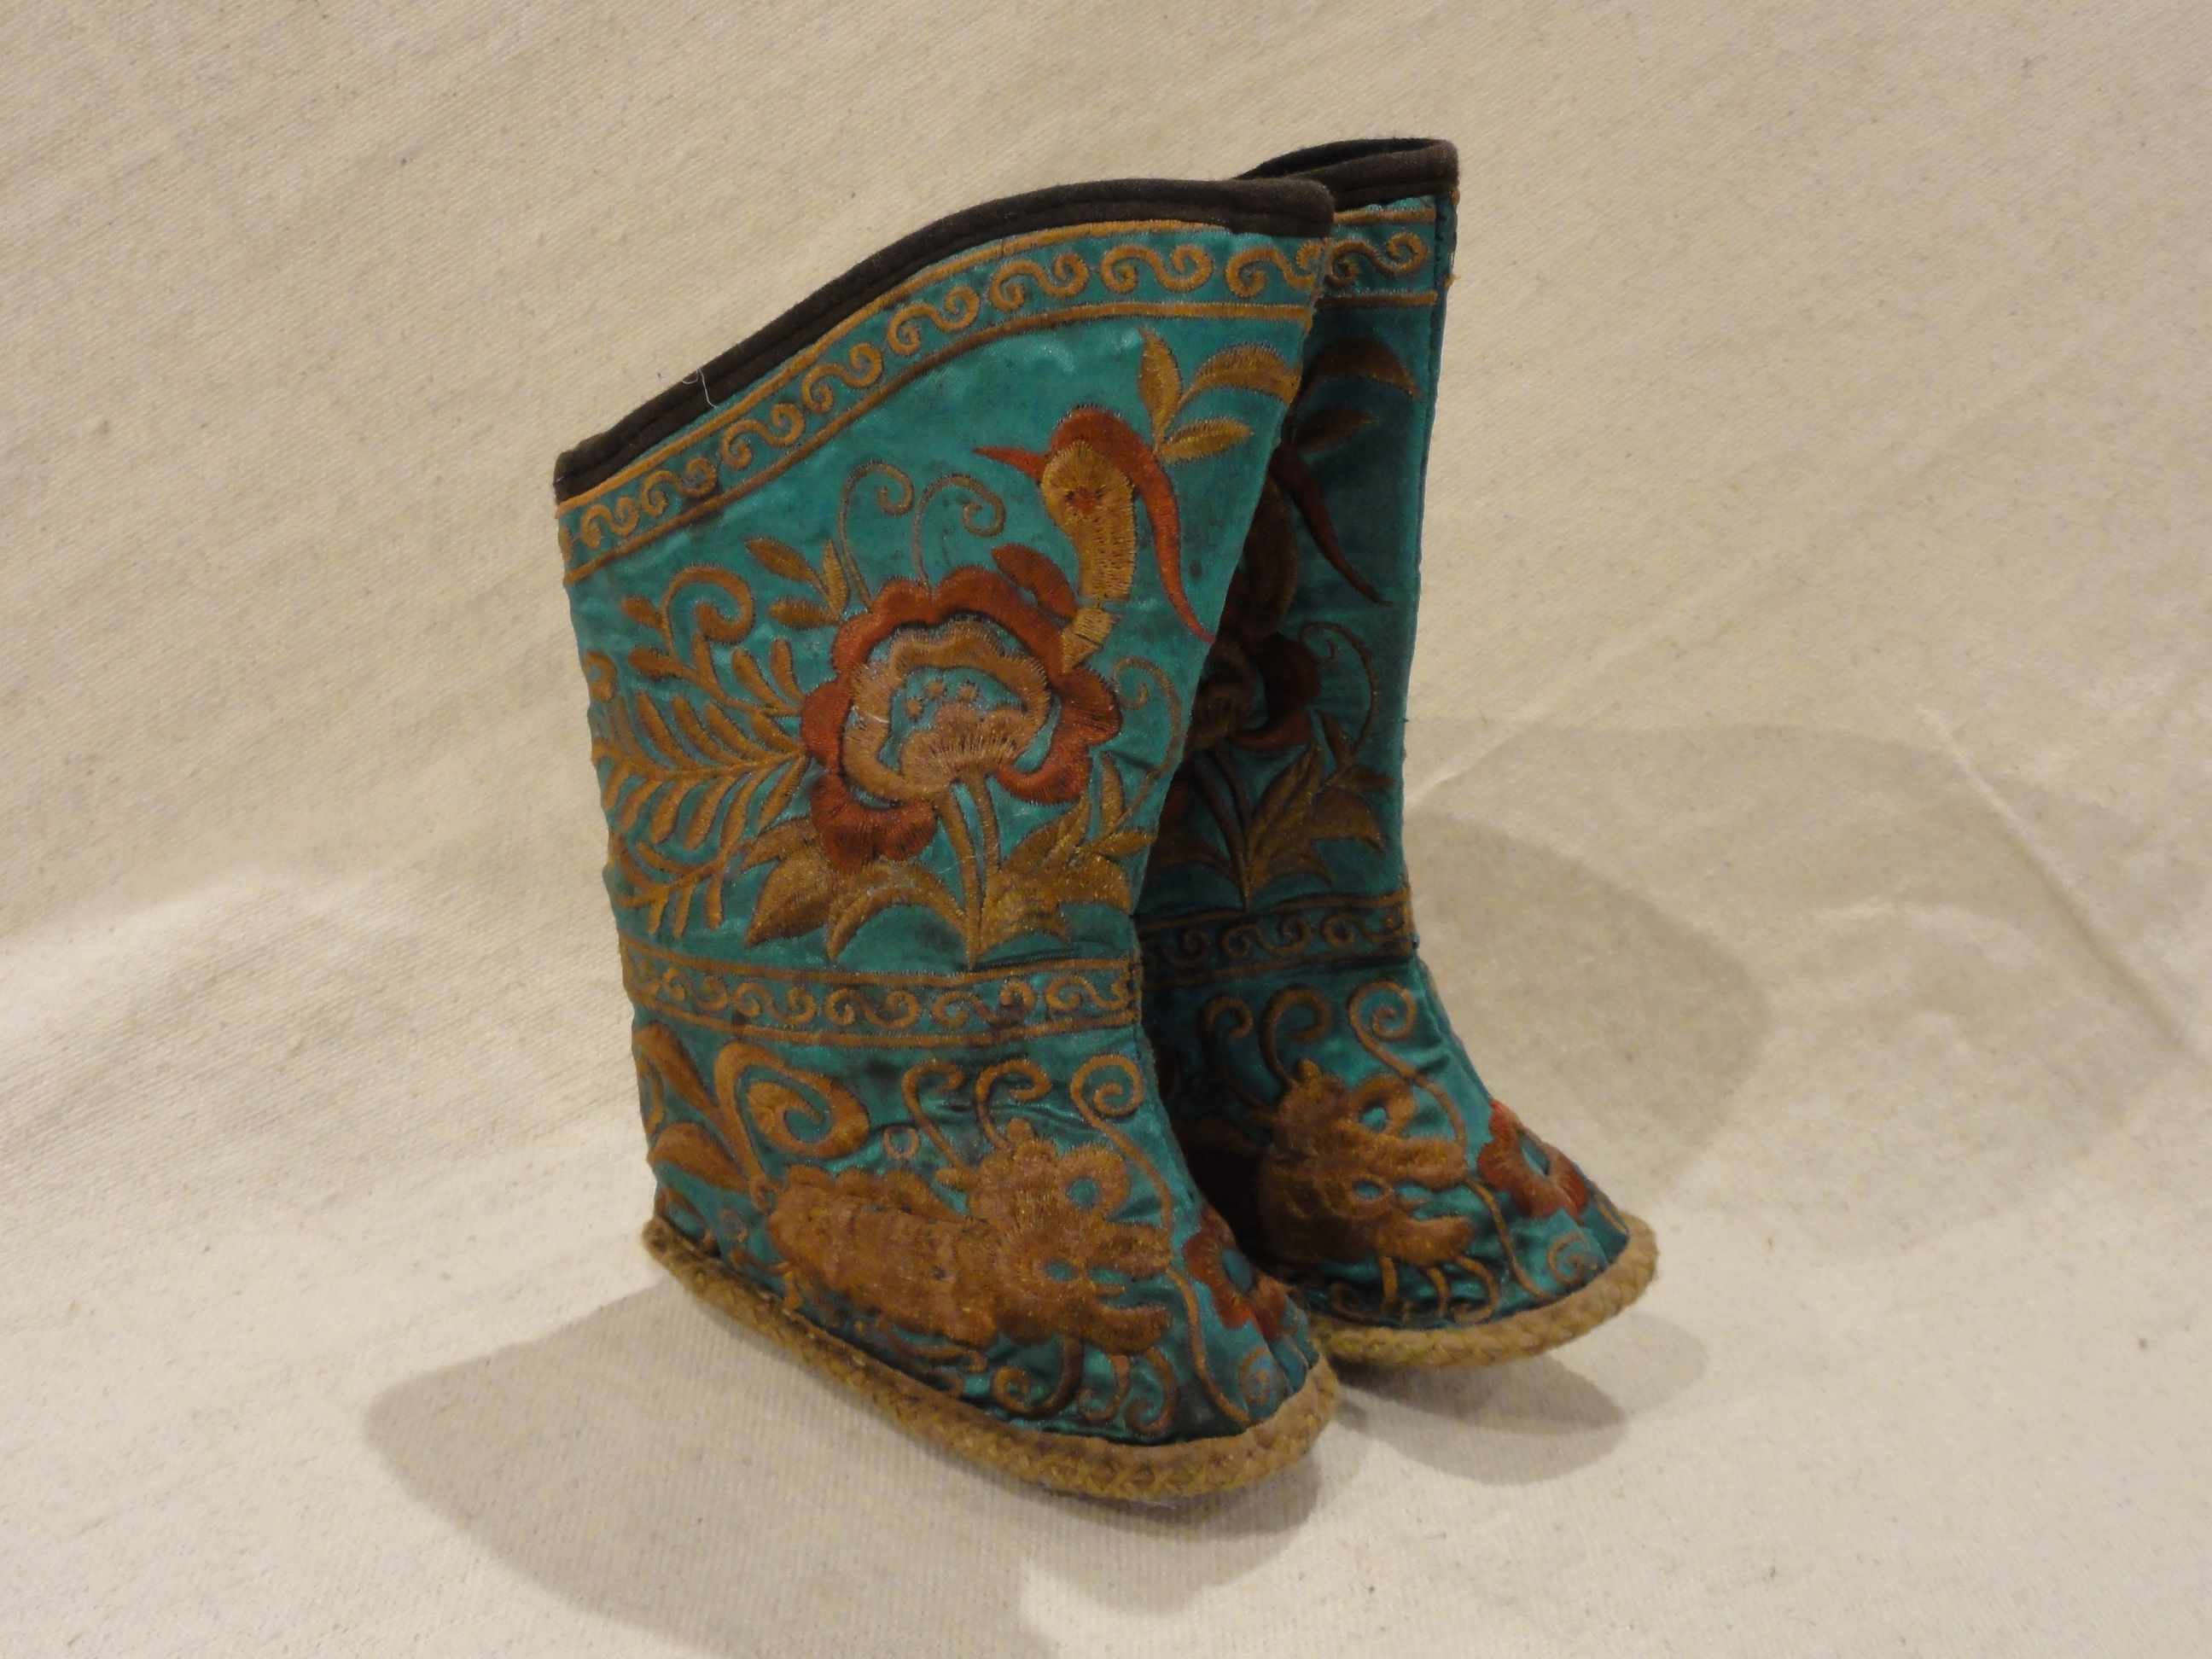 Chinese Binding Shoe santa barbara design center-rugs and more-design santa barbara-appraisal-1